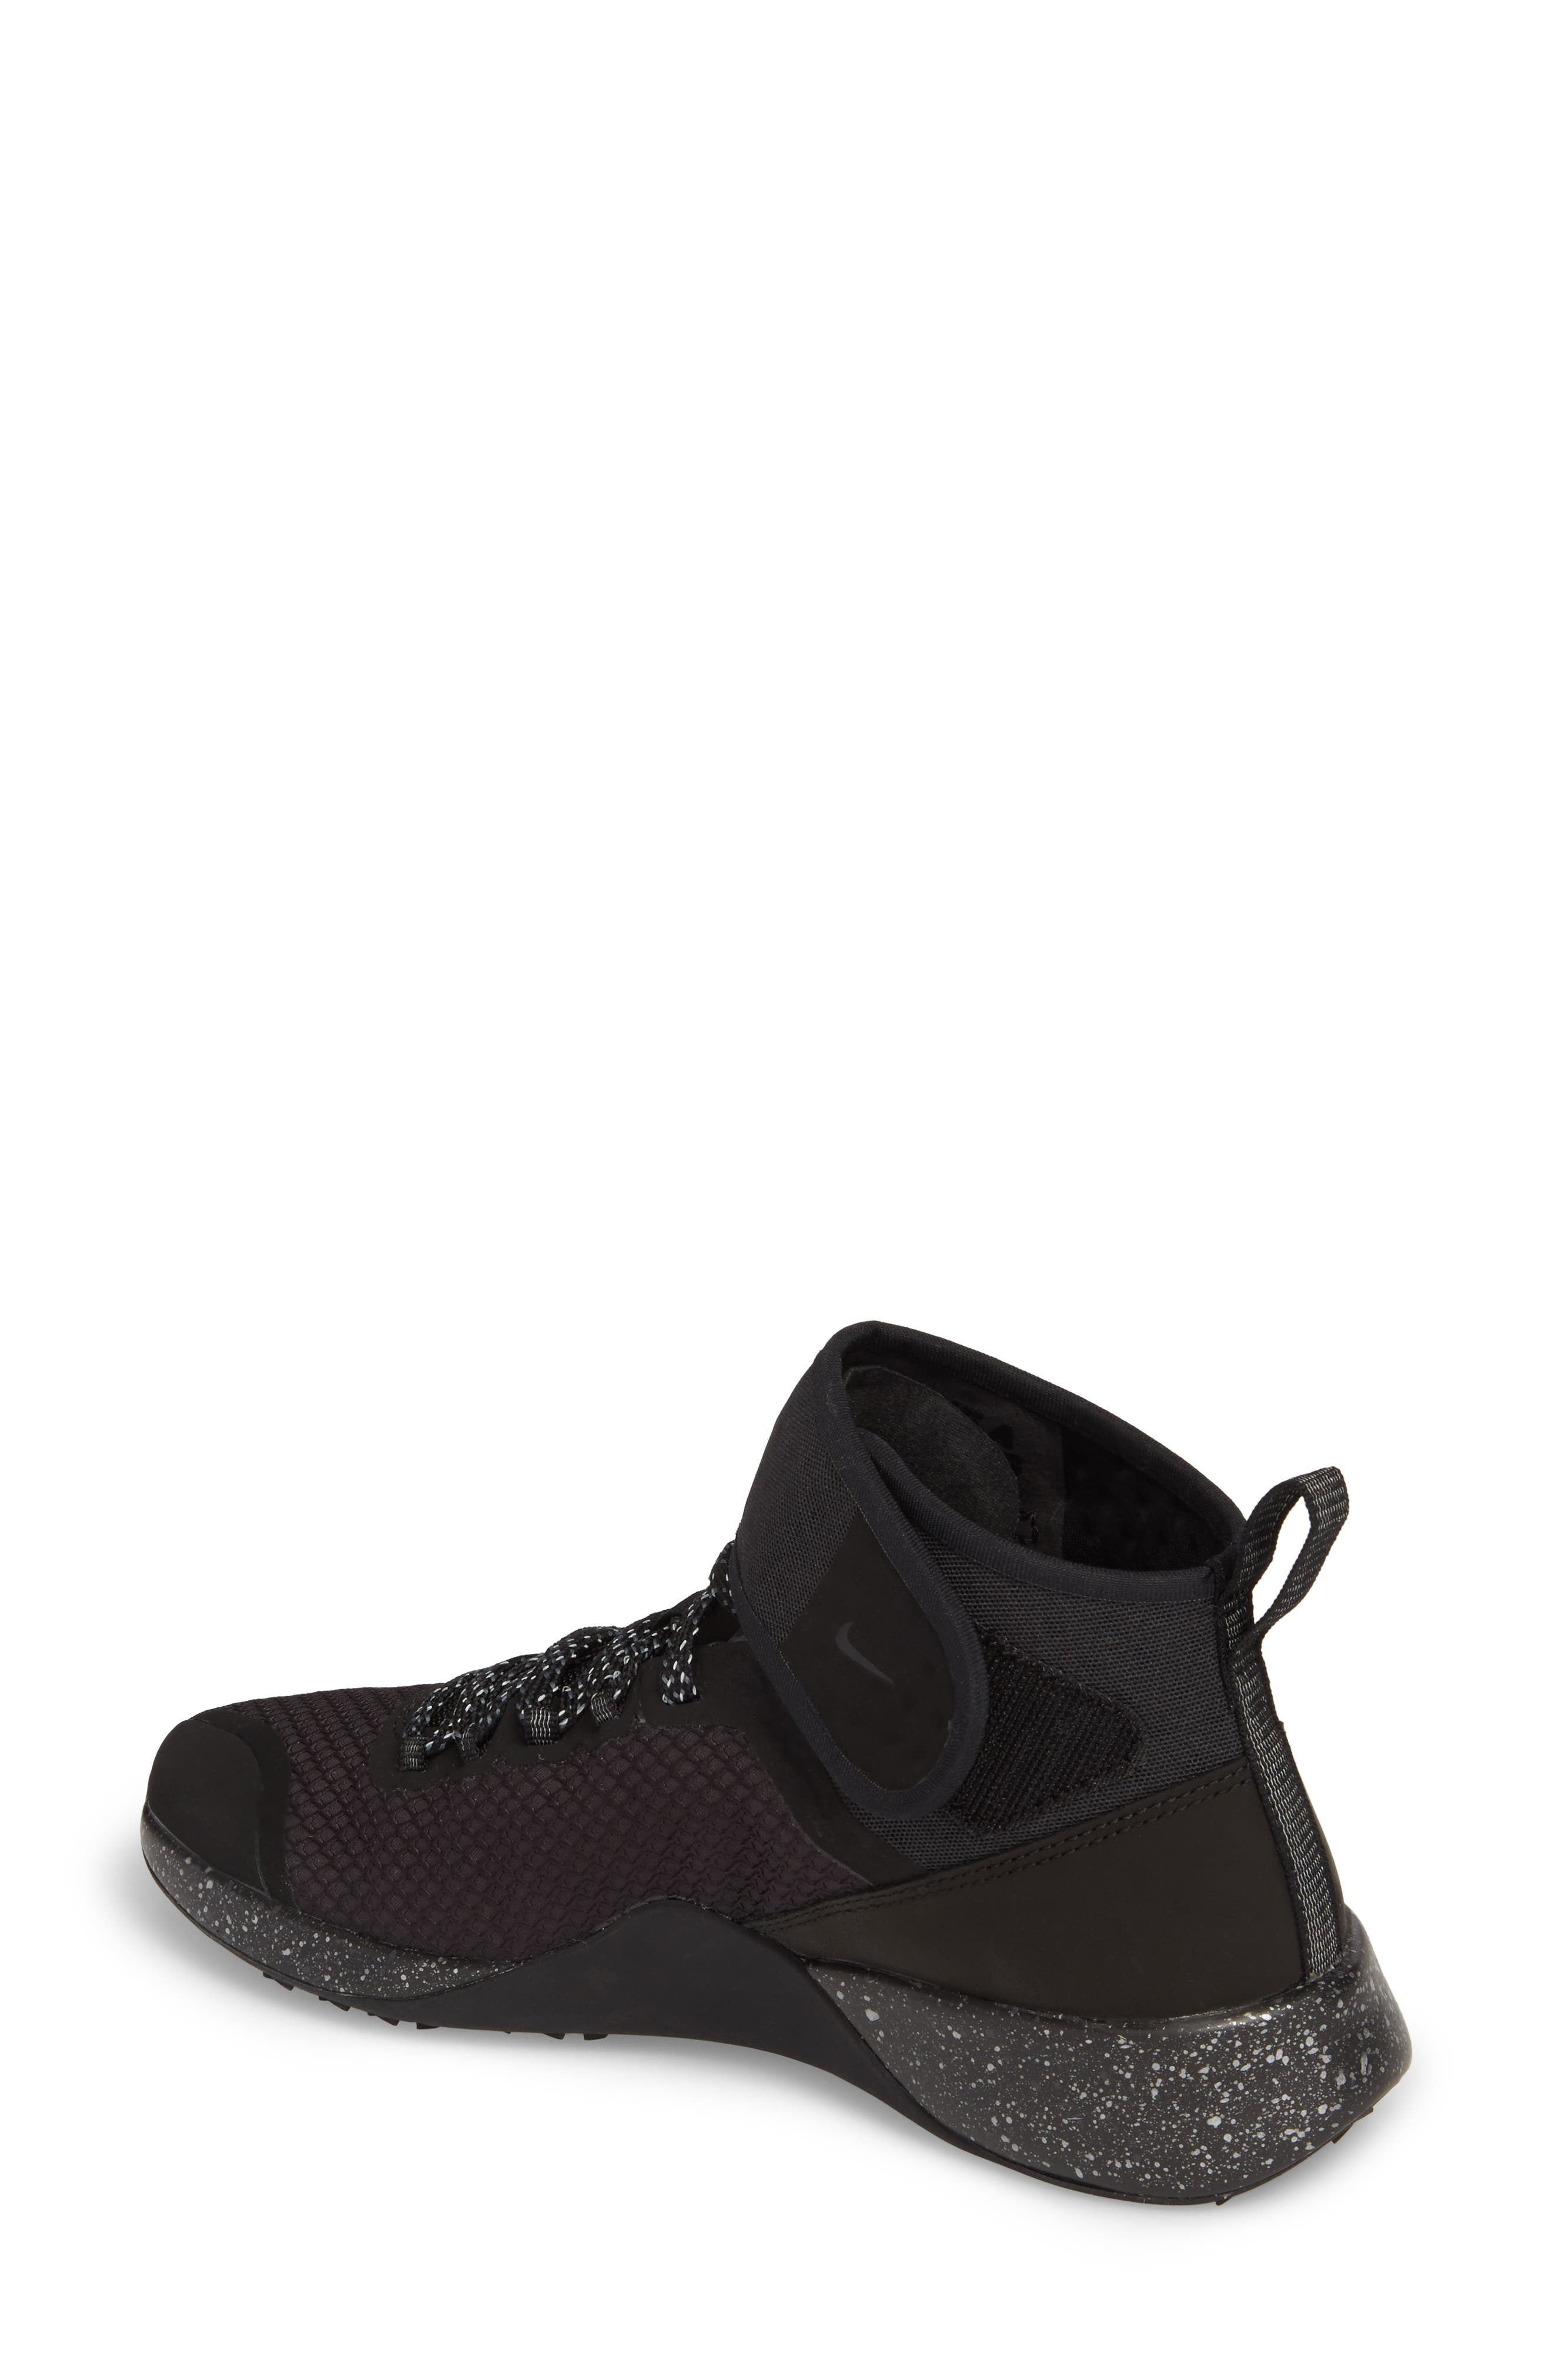 NikeLab Air Zoom Strong 2 Training Shoe,                             Alternate thumbnail 2, color,                             001